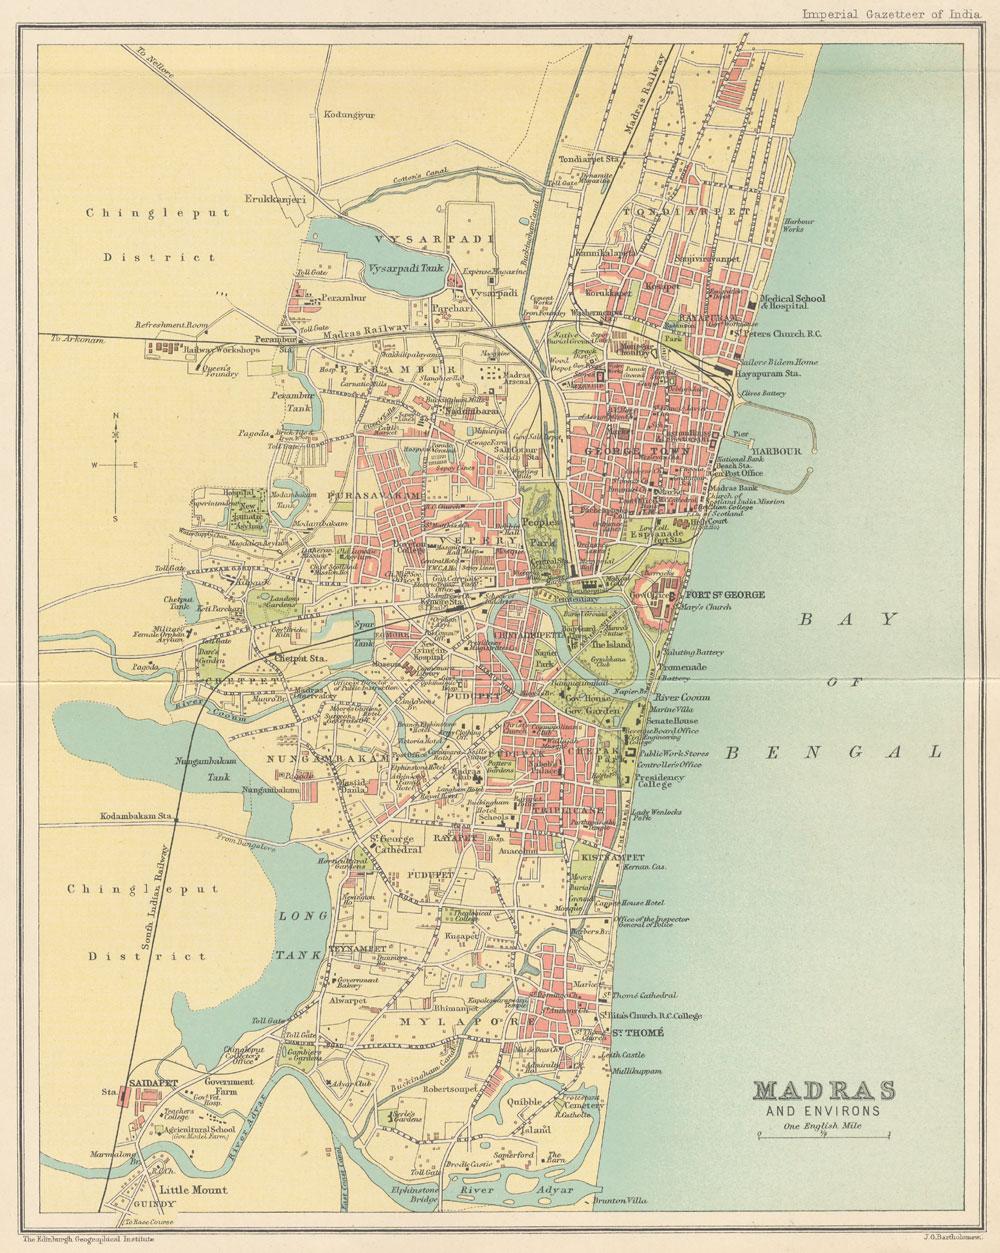 Speculation on Property in Chennai: Location Perungudi